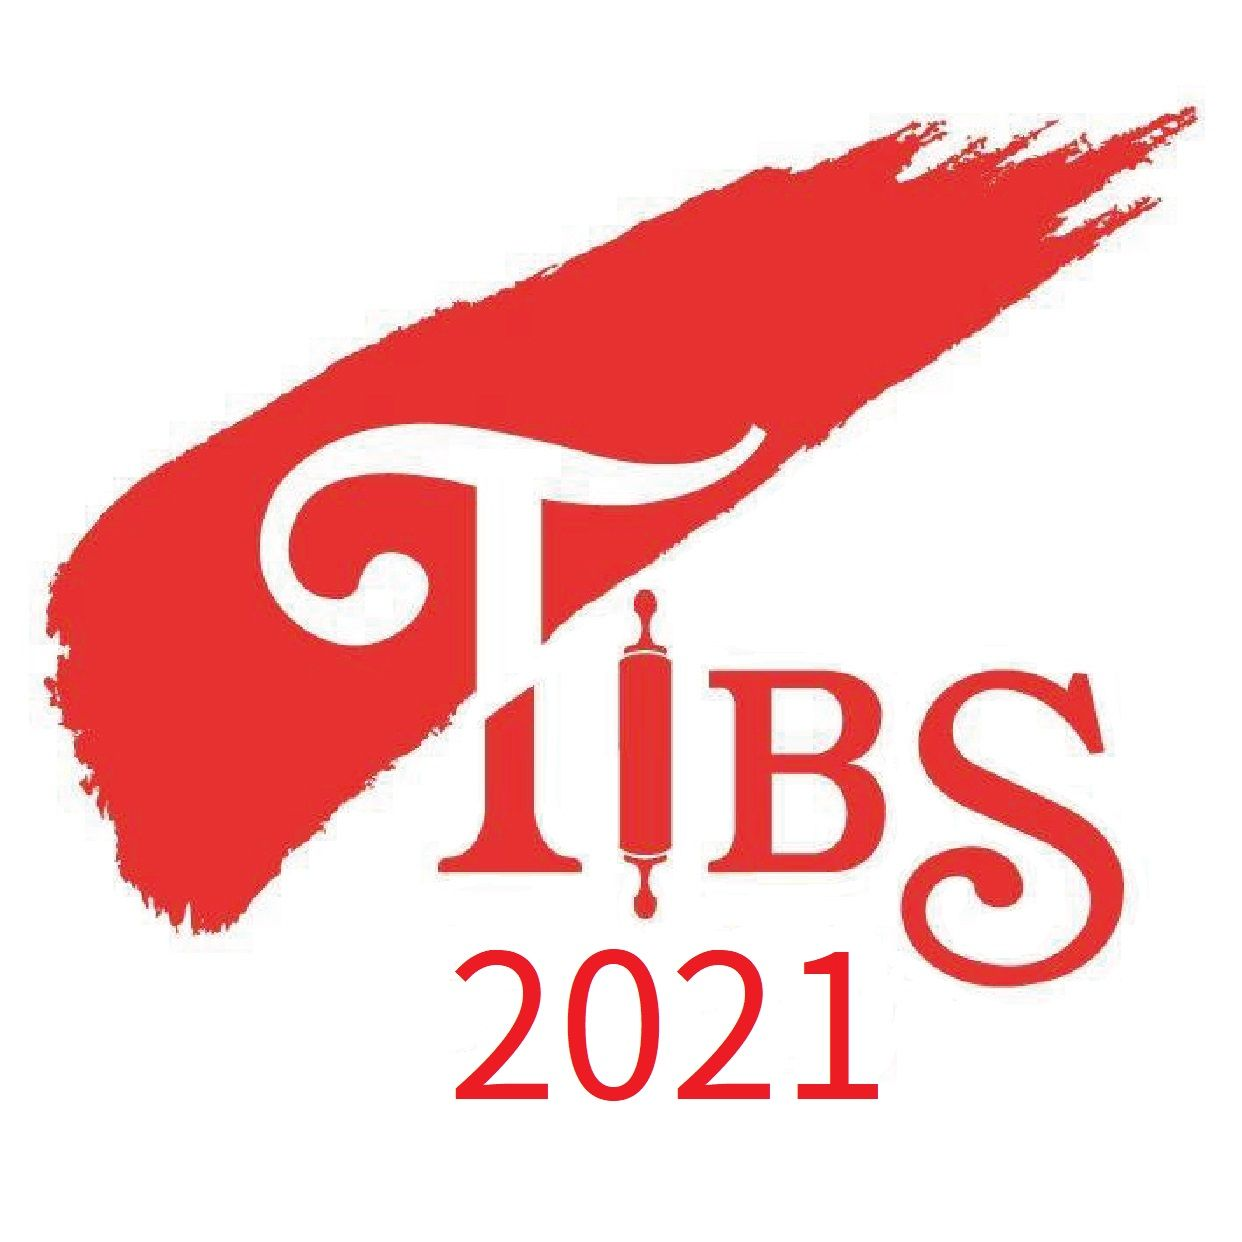 TIBS 2021